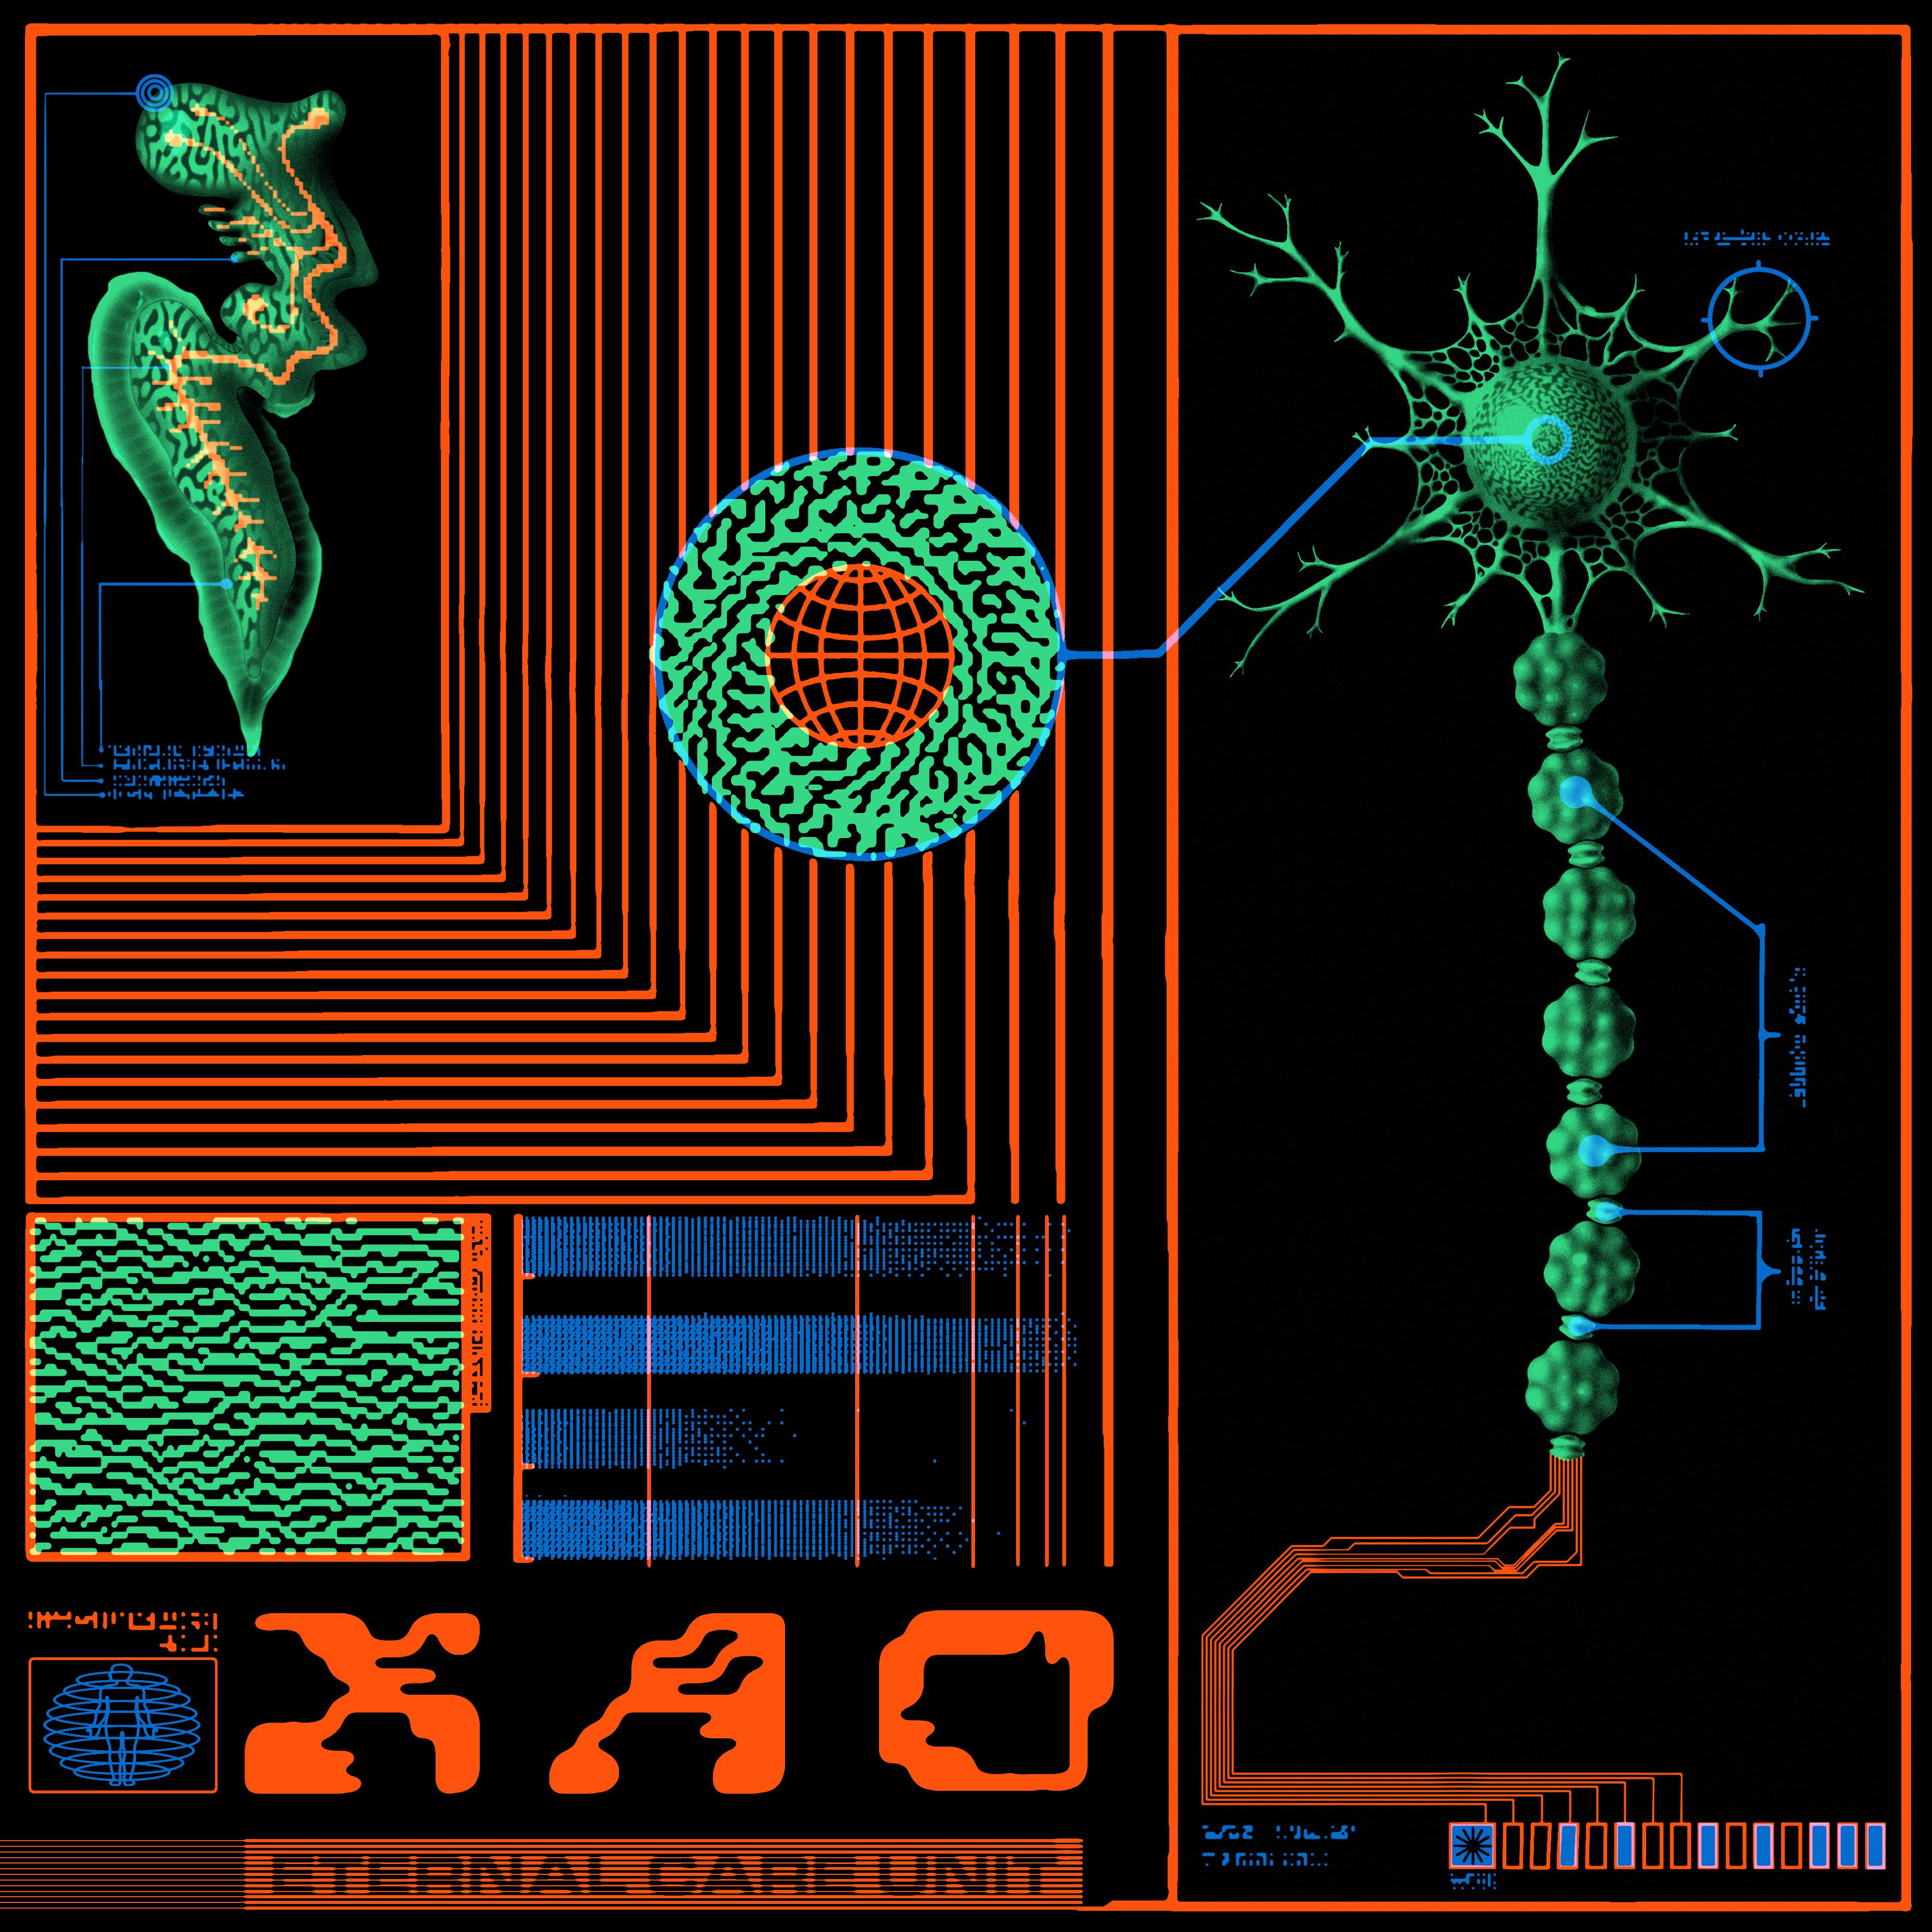 Xao - Eternal Care Unit